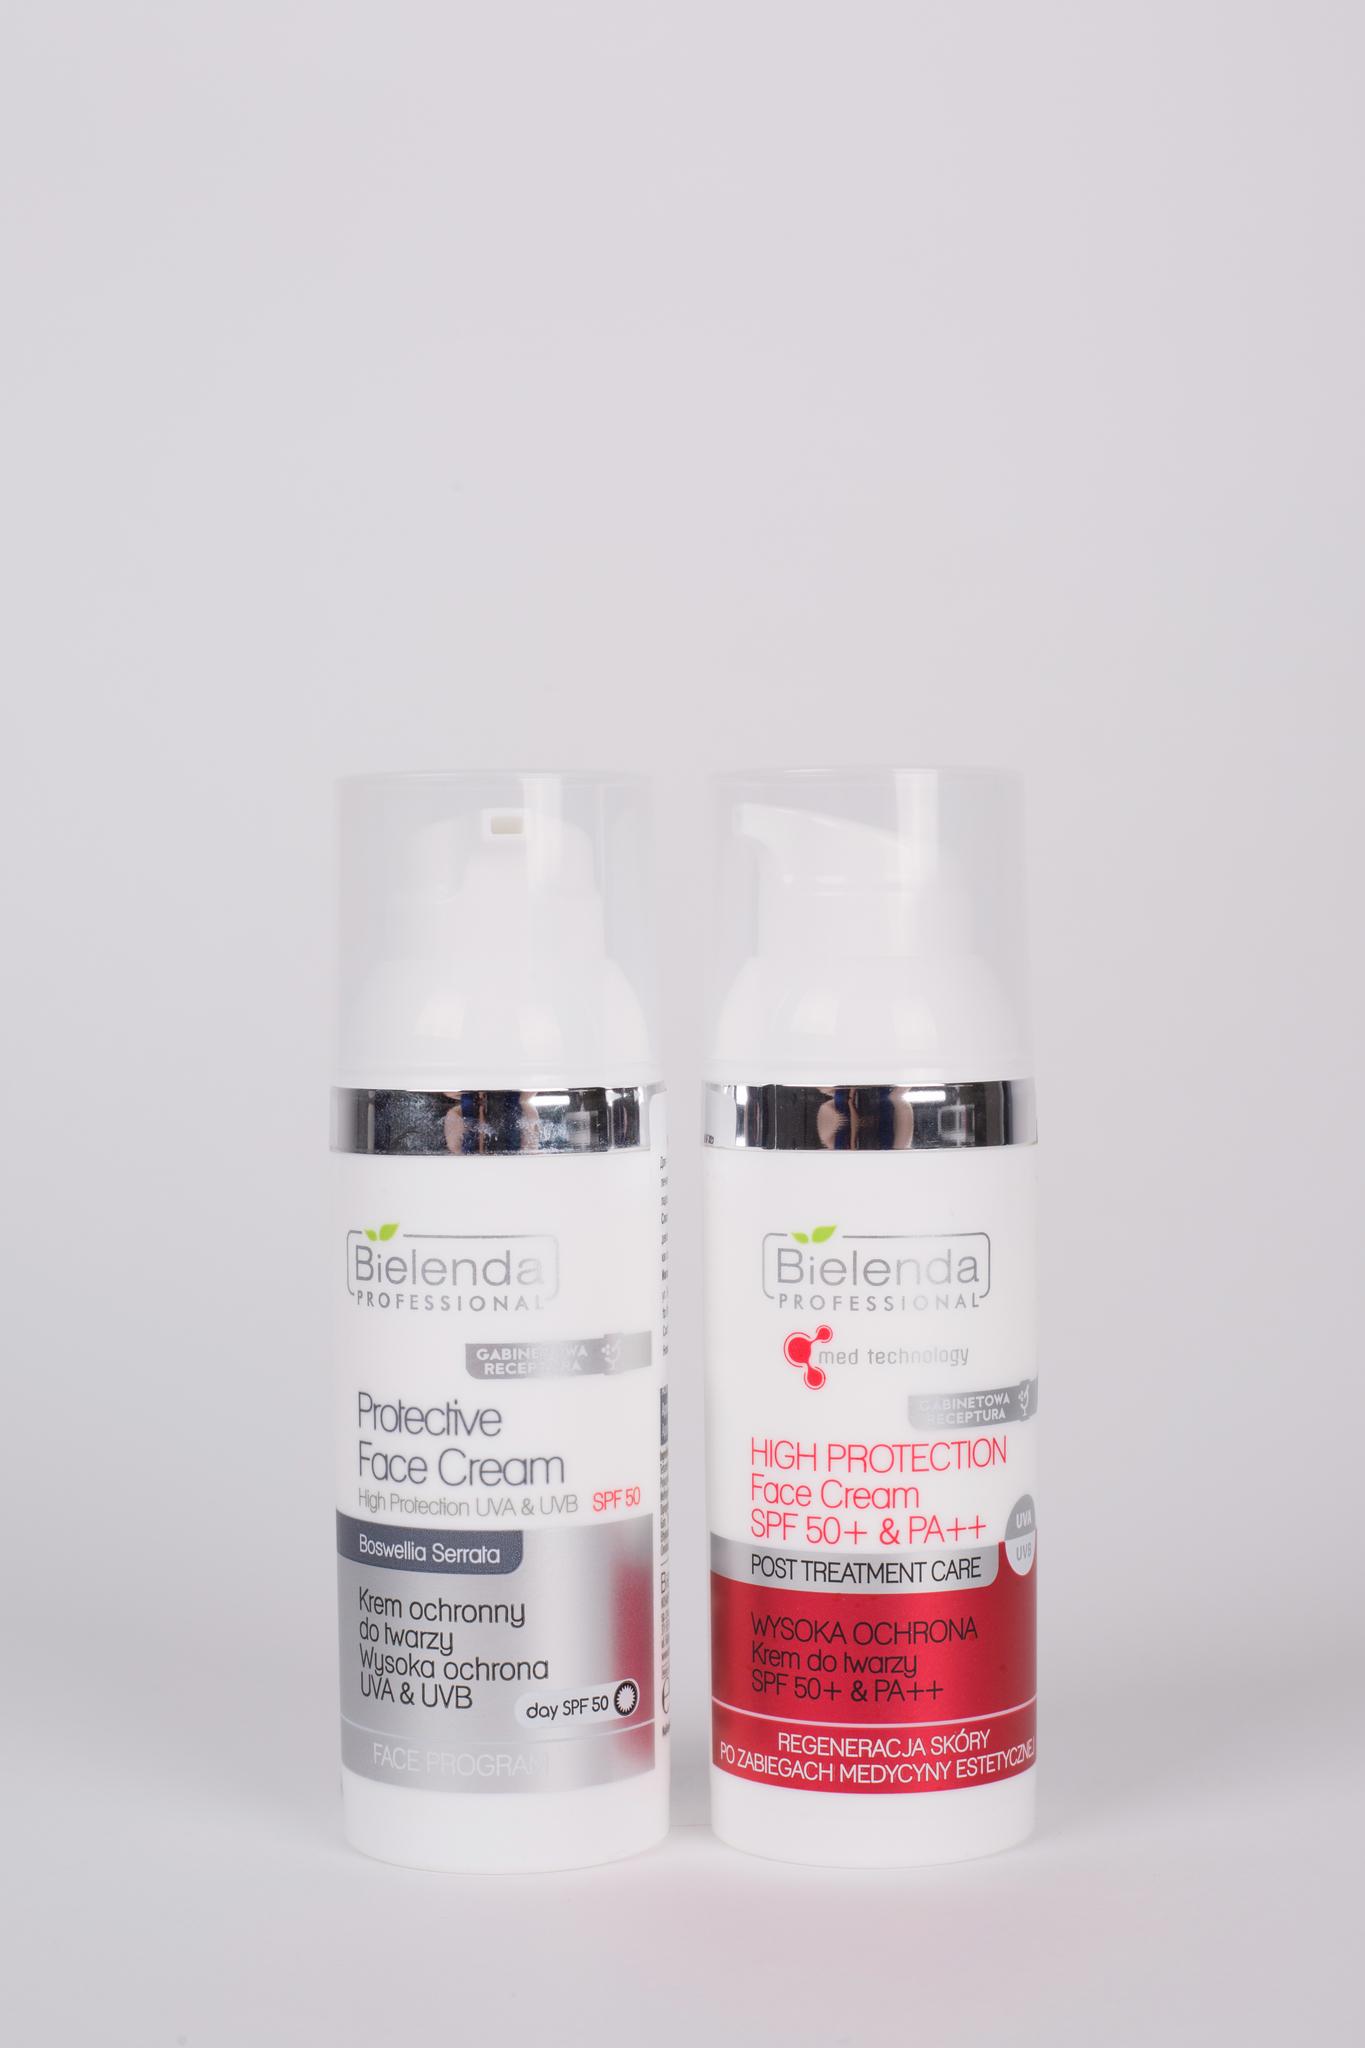 POST TREATMENT CARE крем для  защиты лица, SPF 50 & PA++, 50 мл.